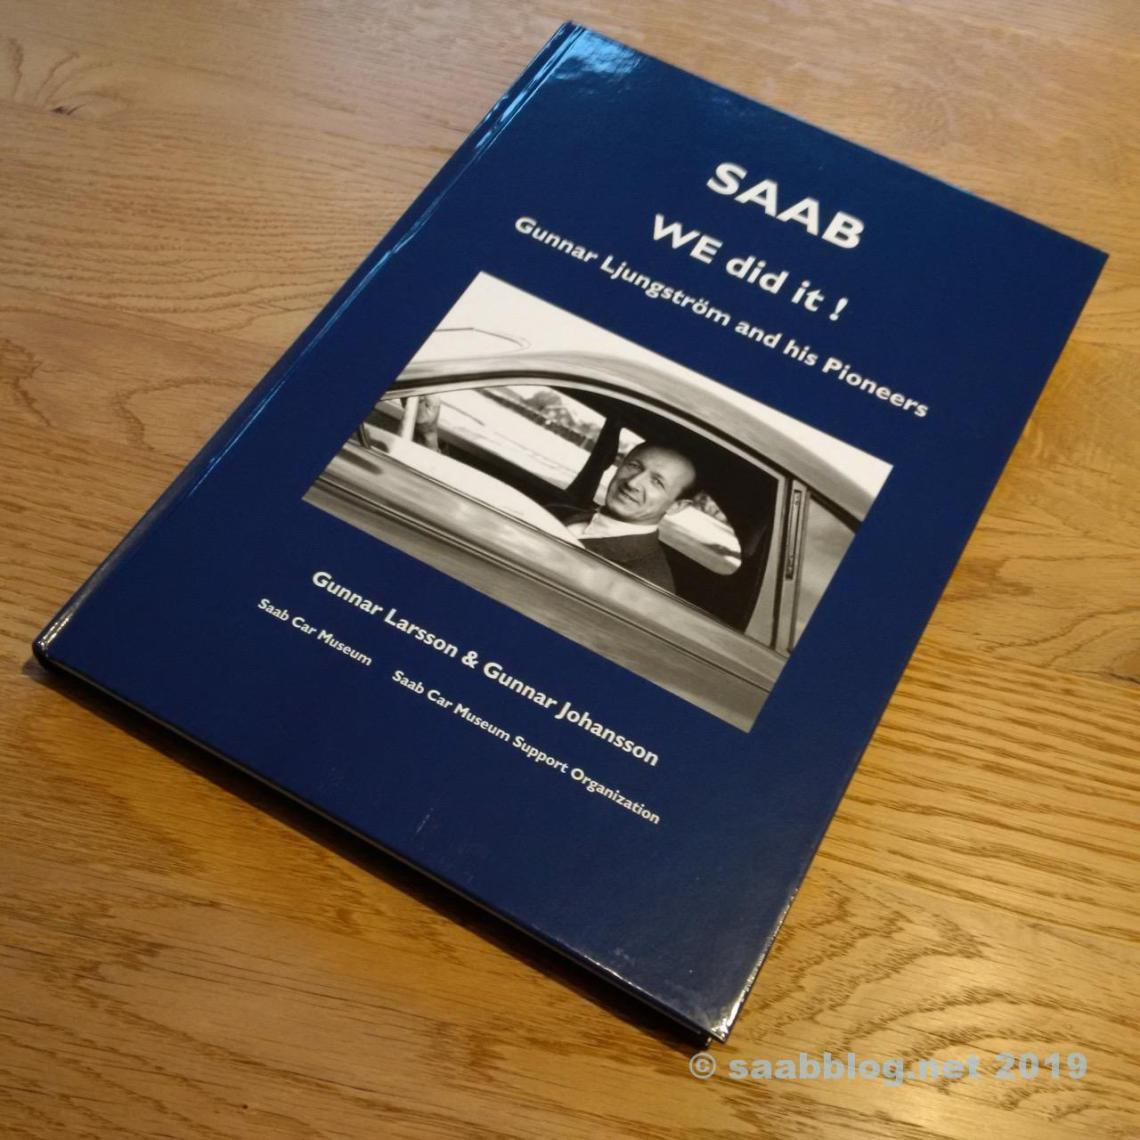 Saab - we did it. New Saab book